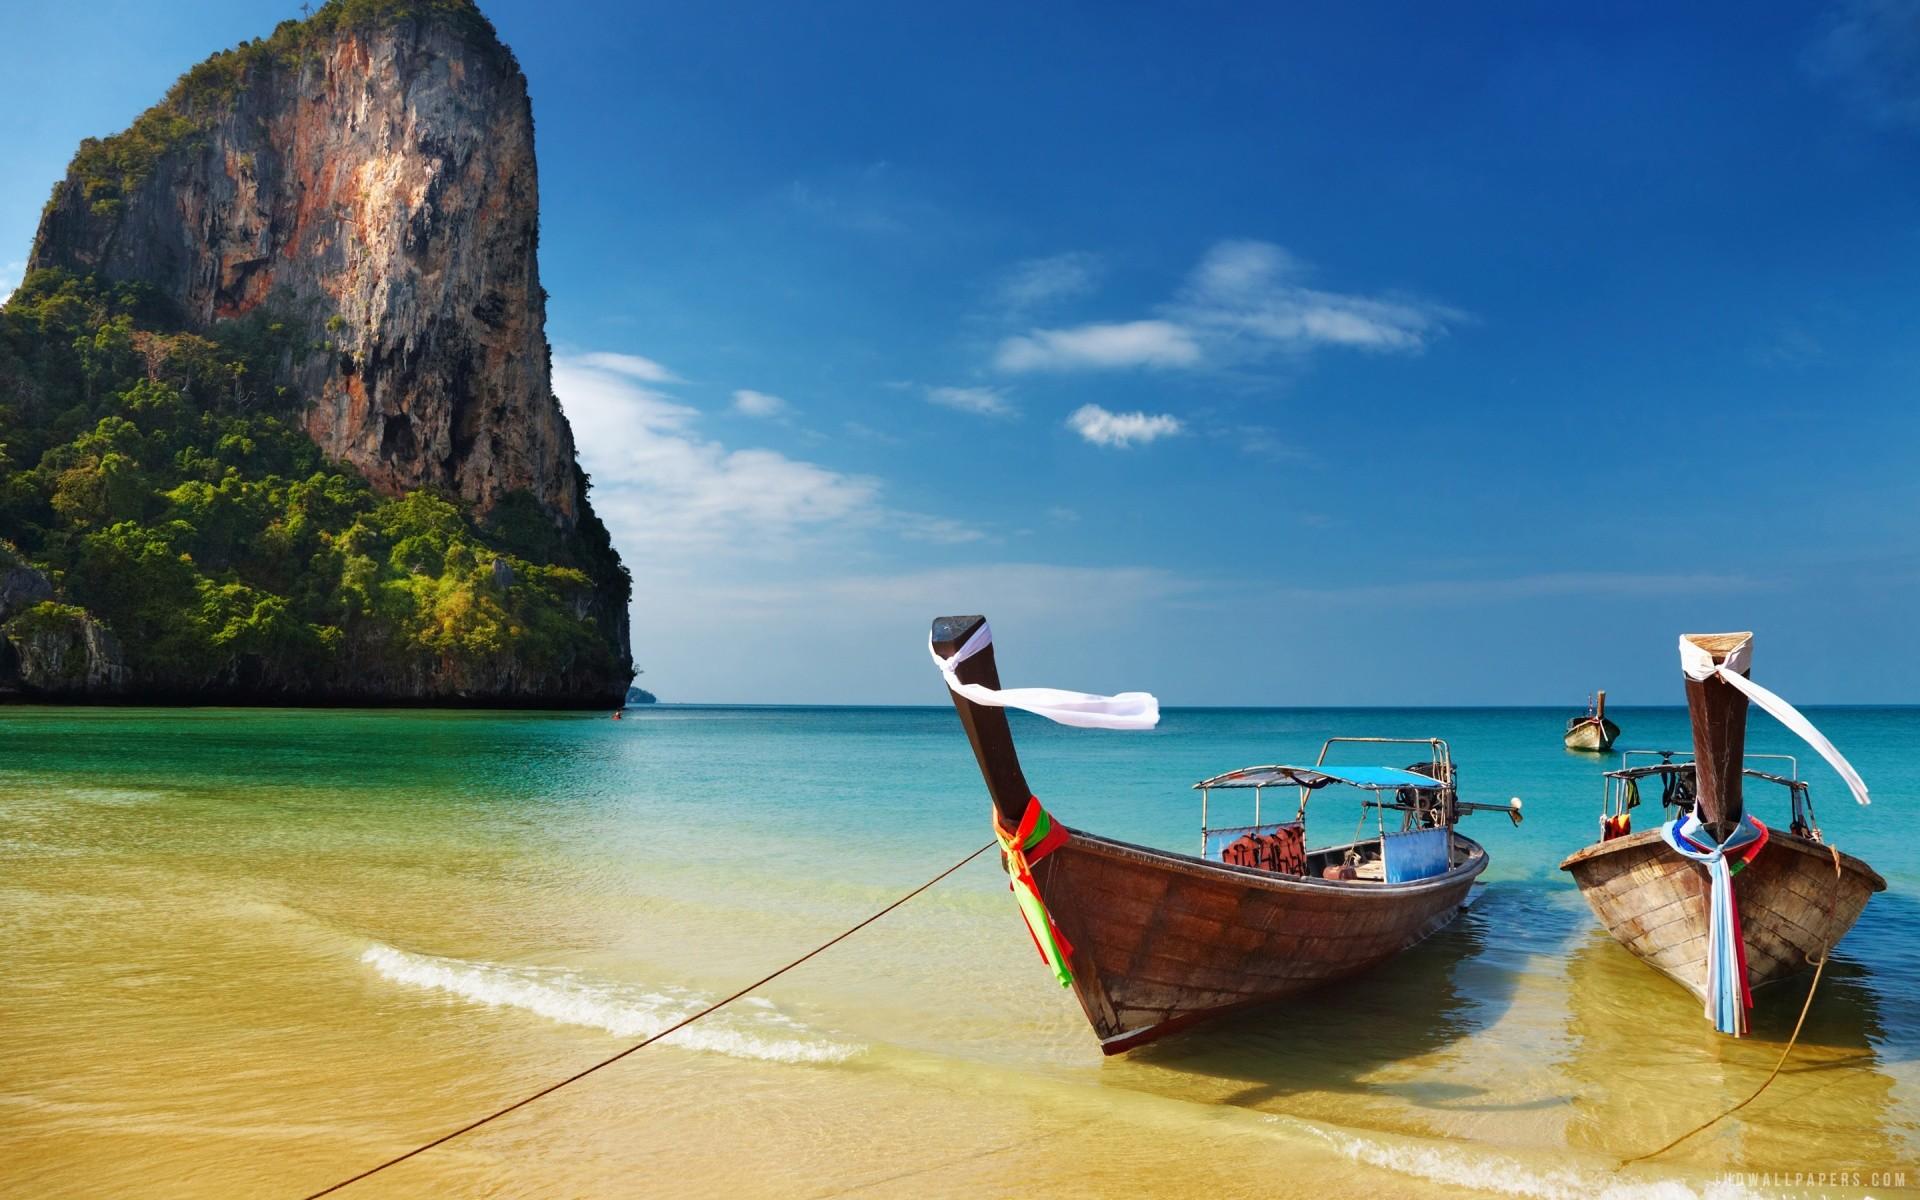 Relaxing Railay Beach Thailand Desktop Background. Download …